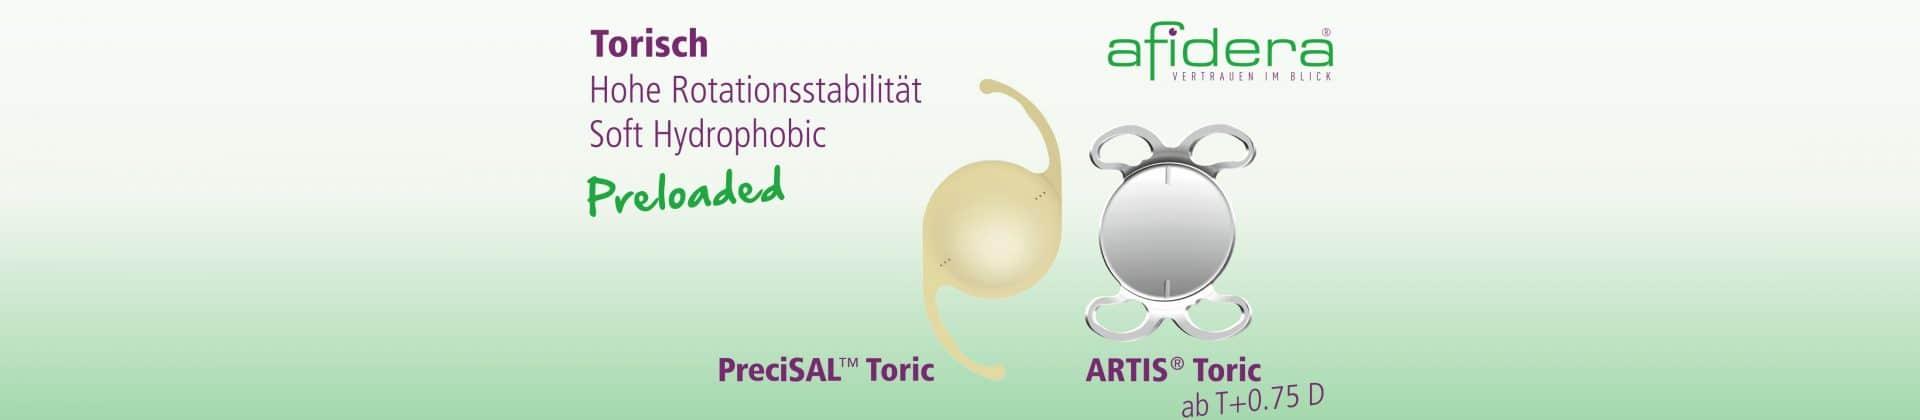 Toric IOL Plattform PreciSAL Toric und ARTIS Toric